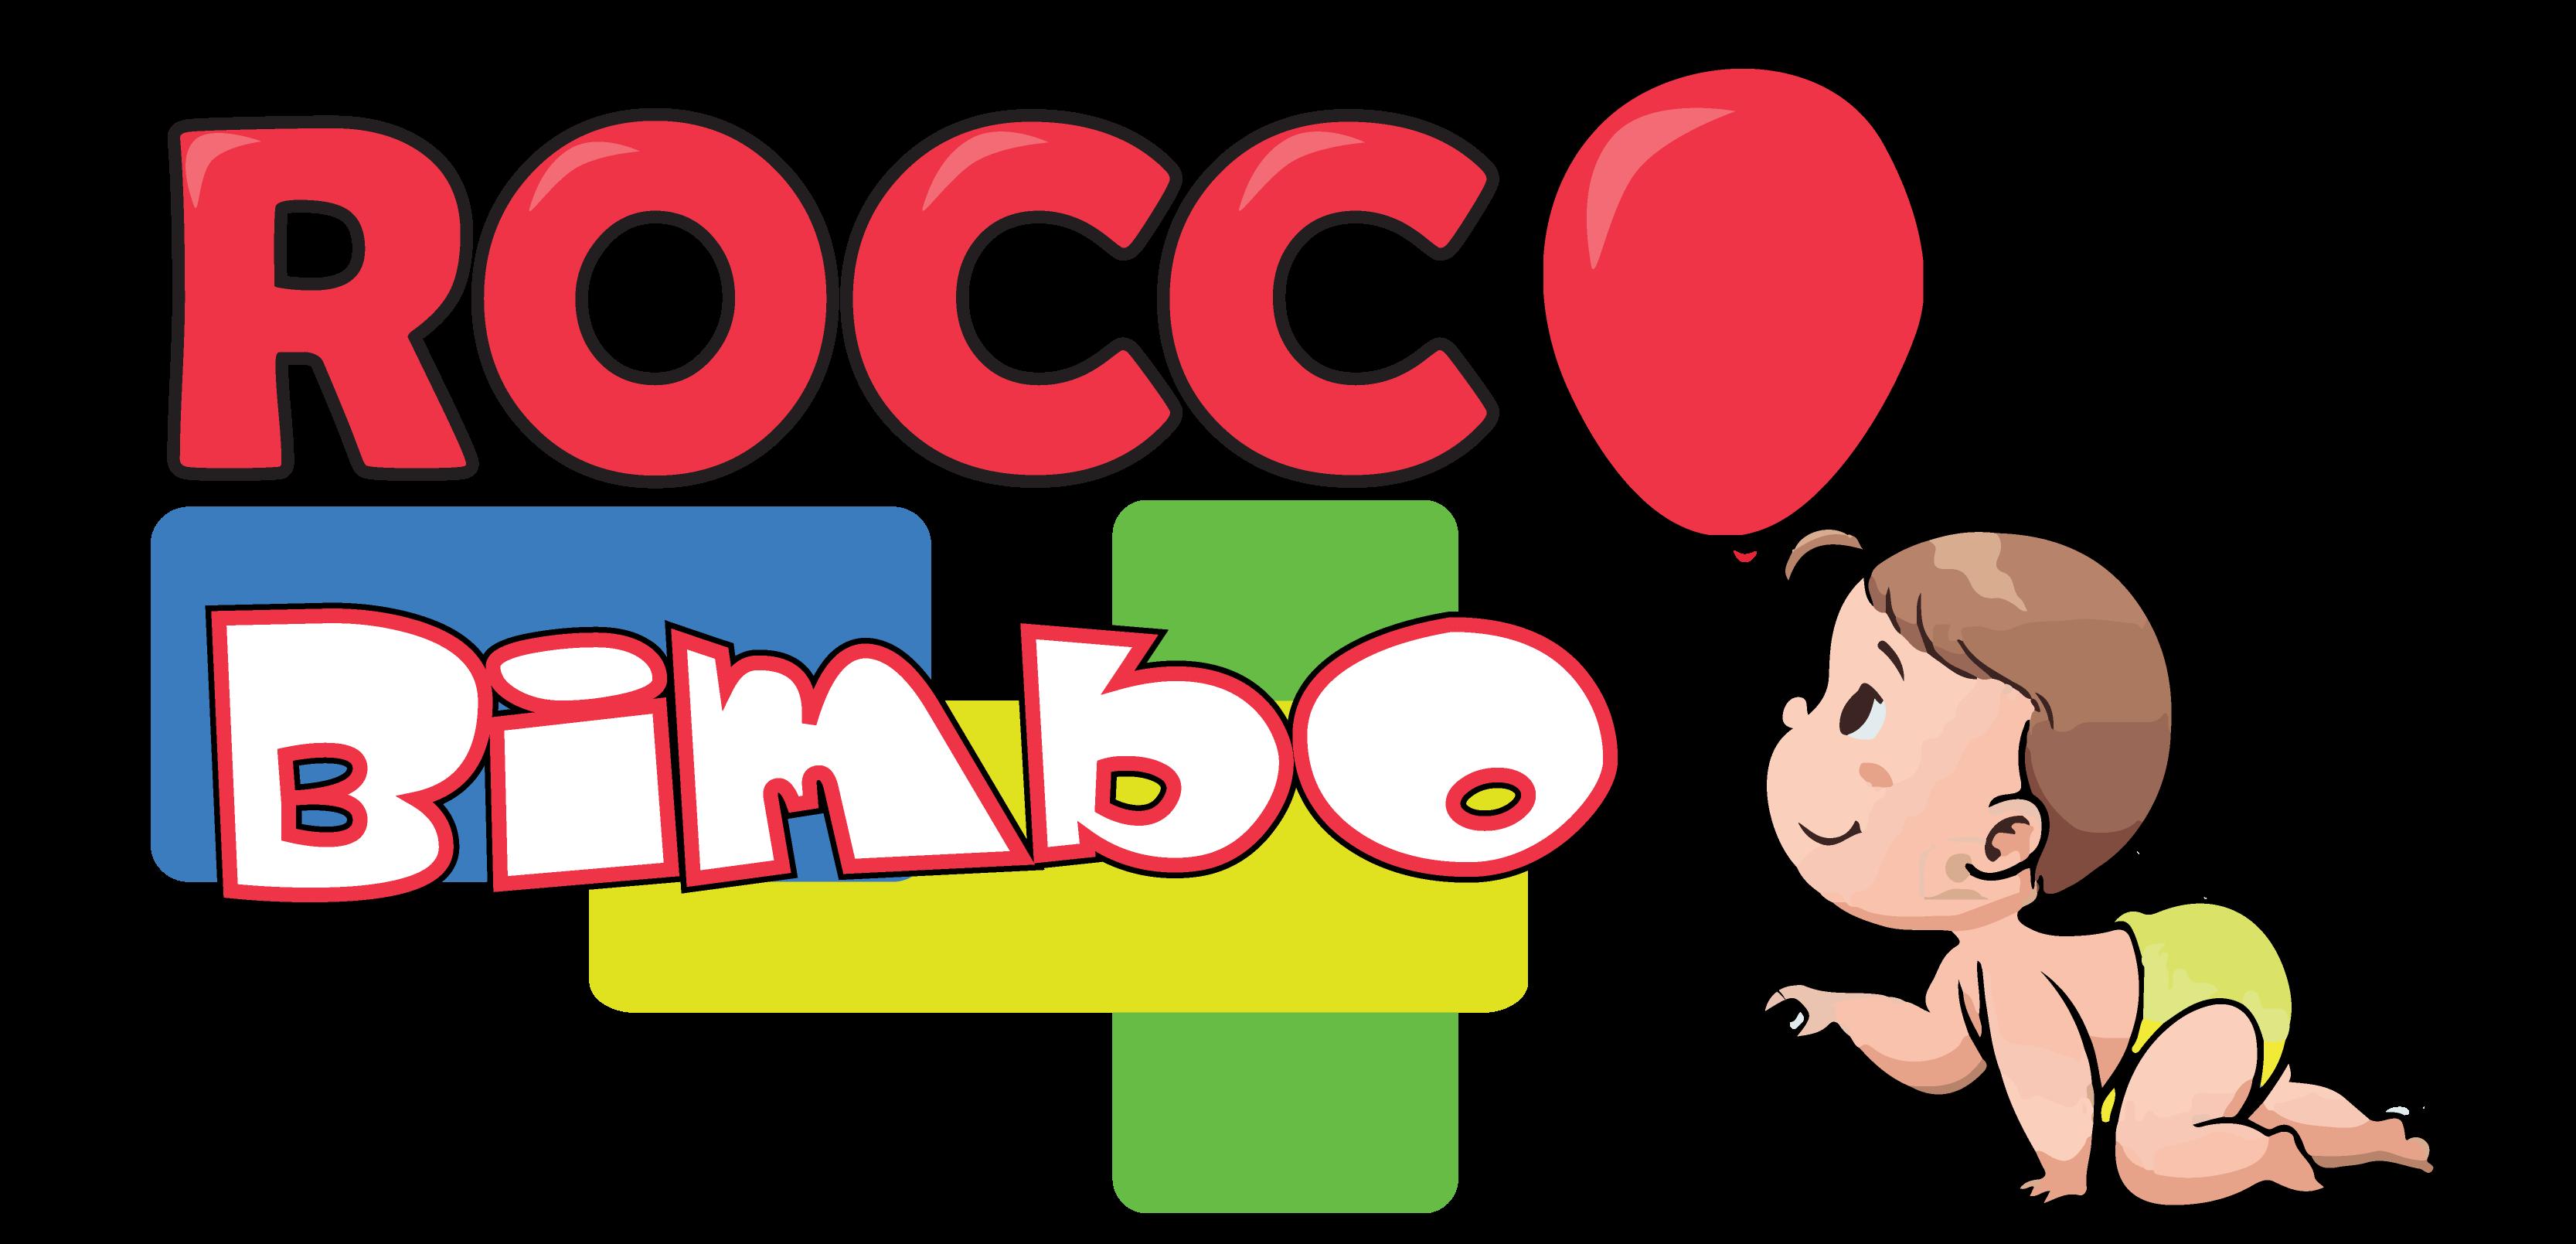 Rocco Bimbo